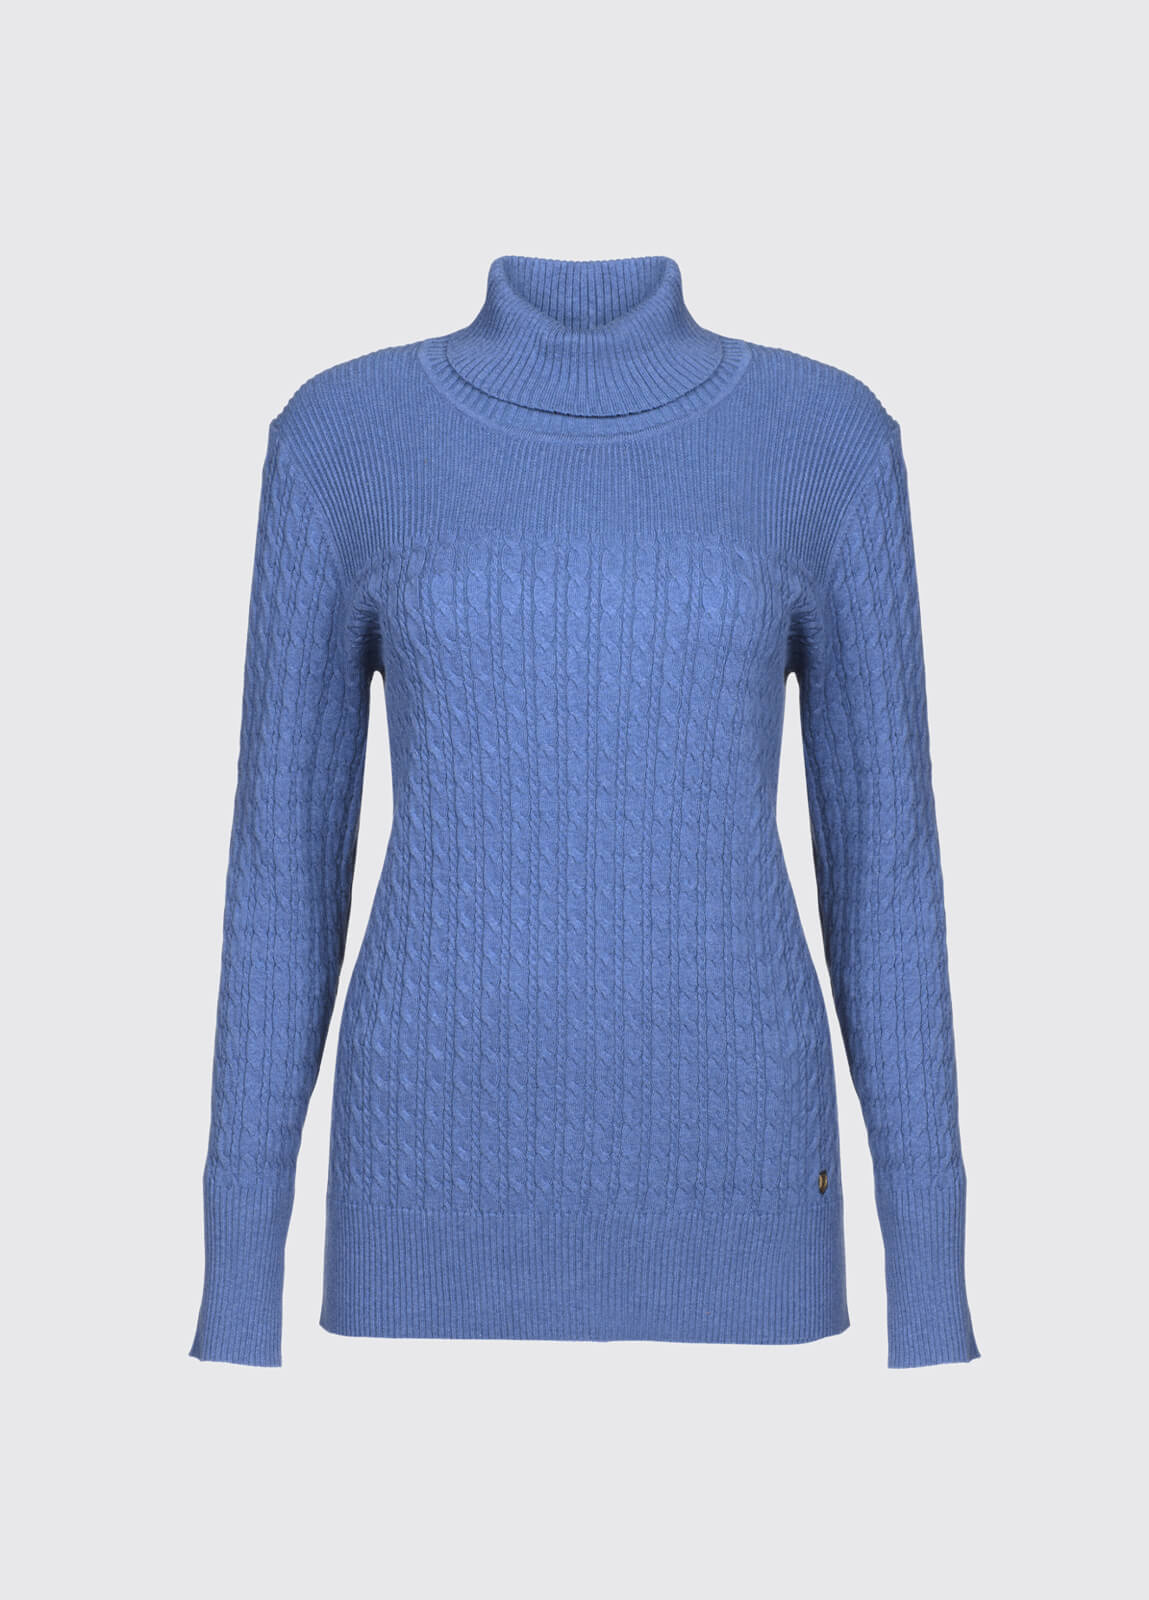 Boylan Polo Neck Sweater - Denim